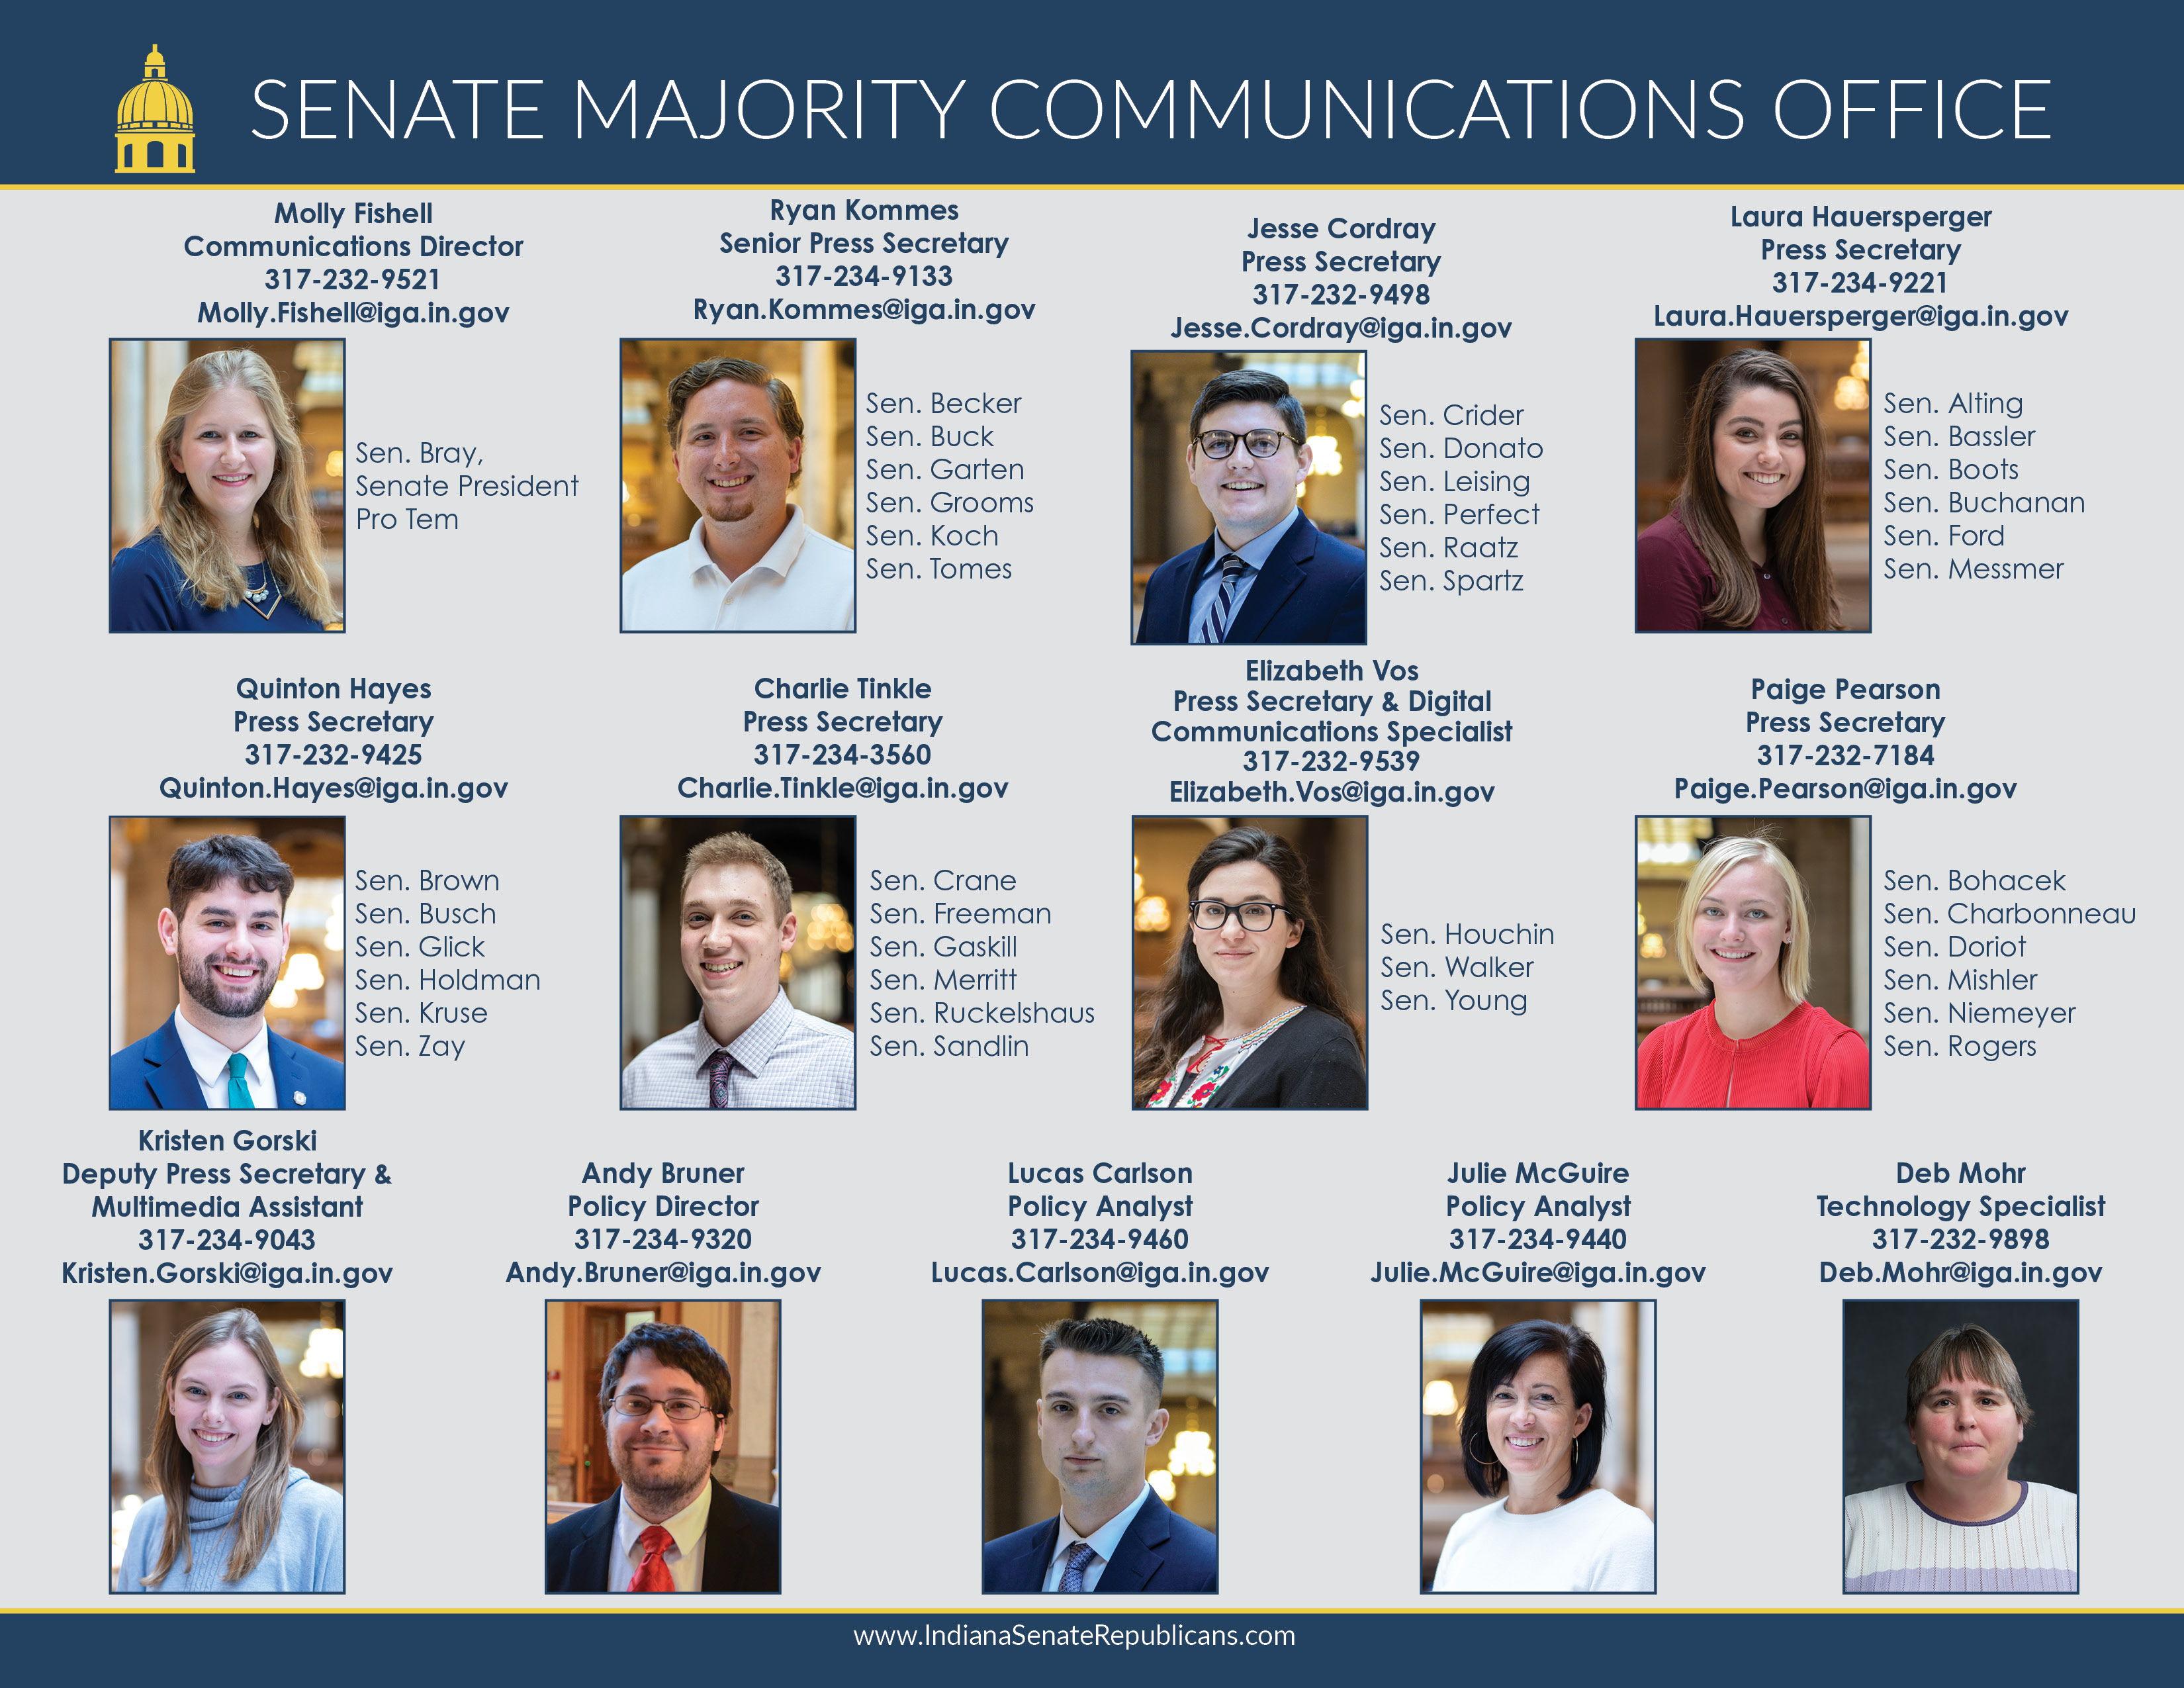 Majority Communications